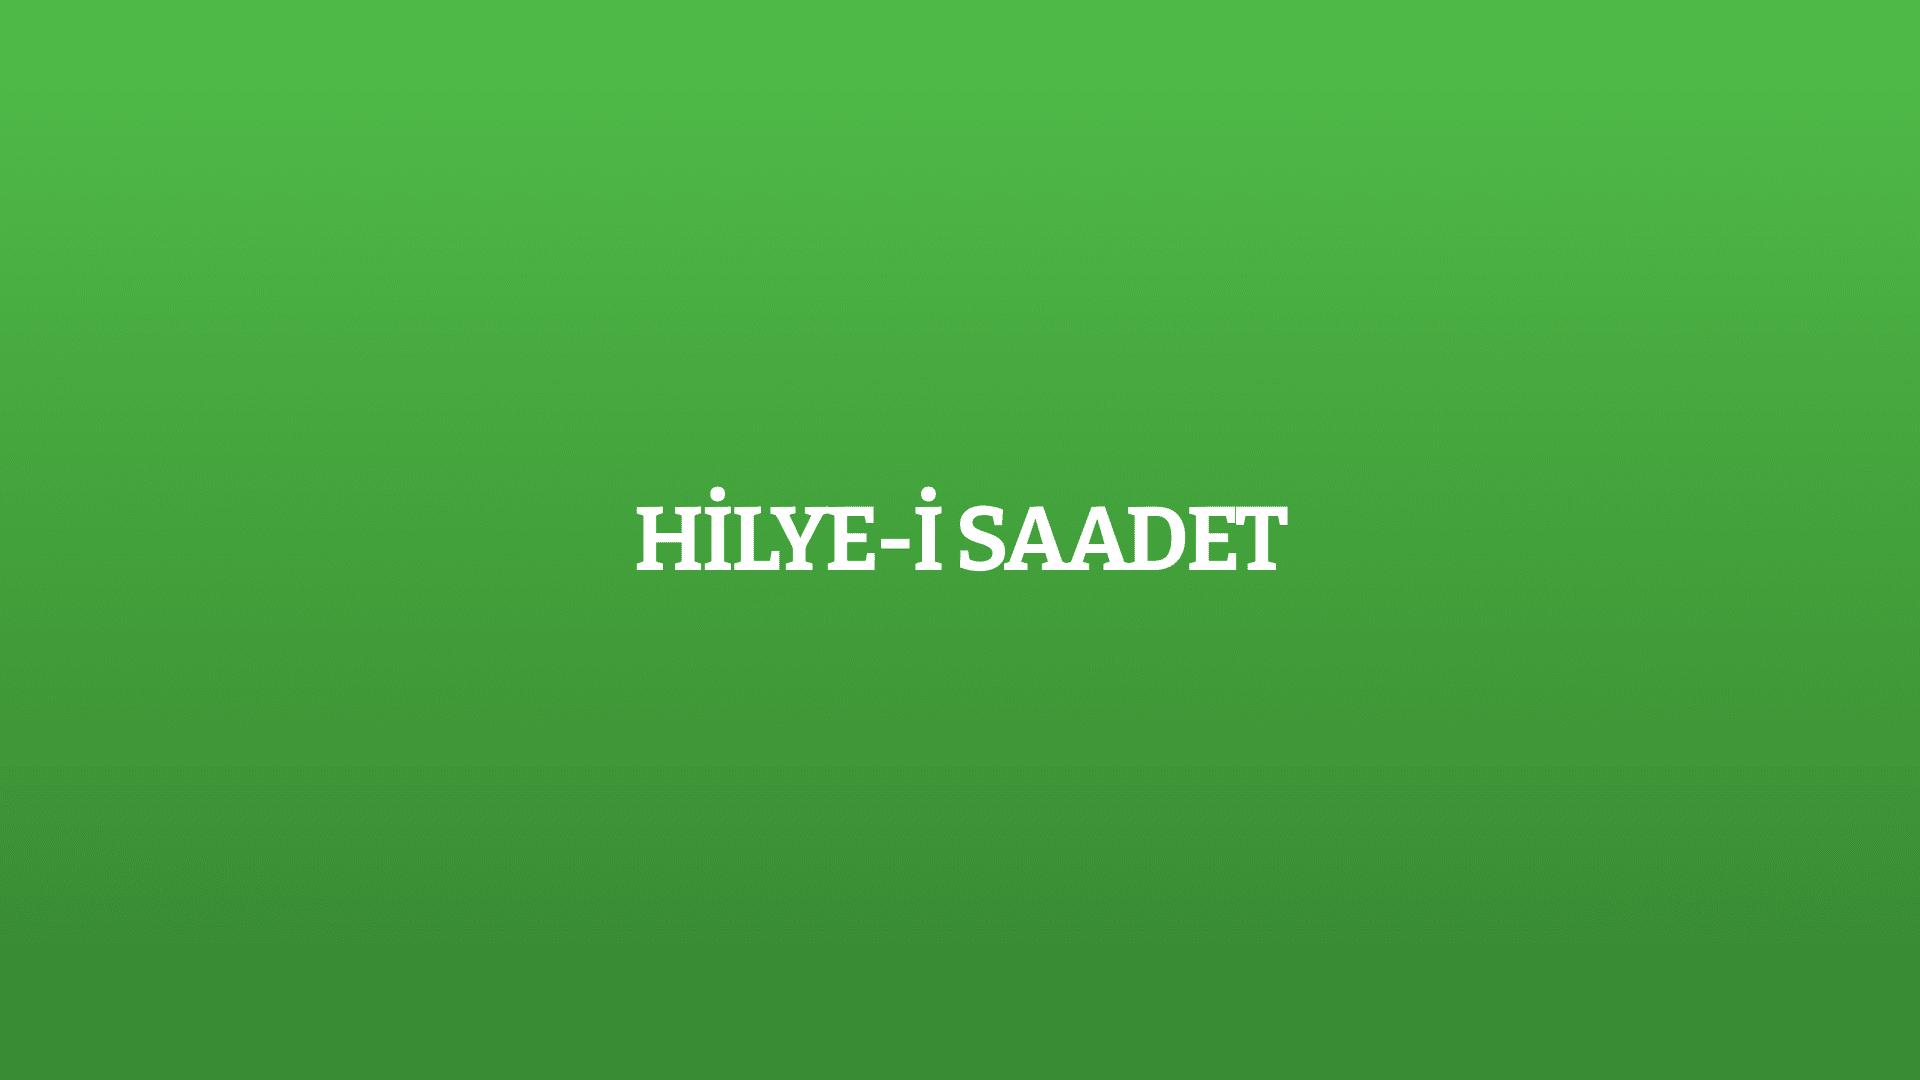 Hilye-i Saadet